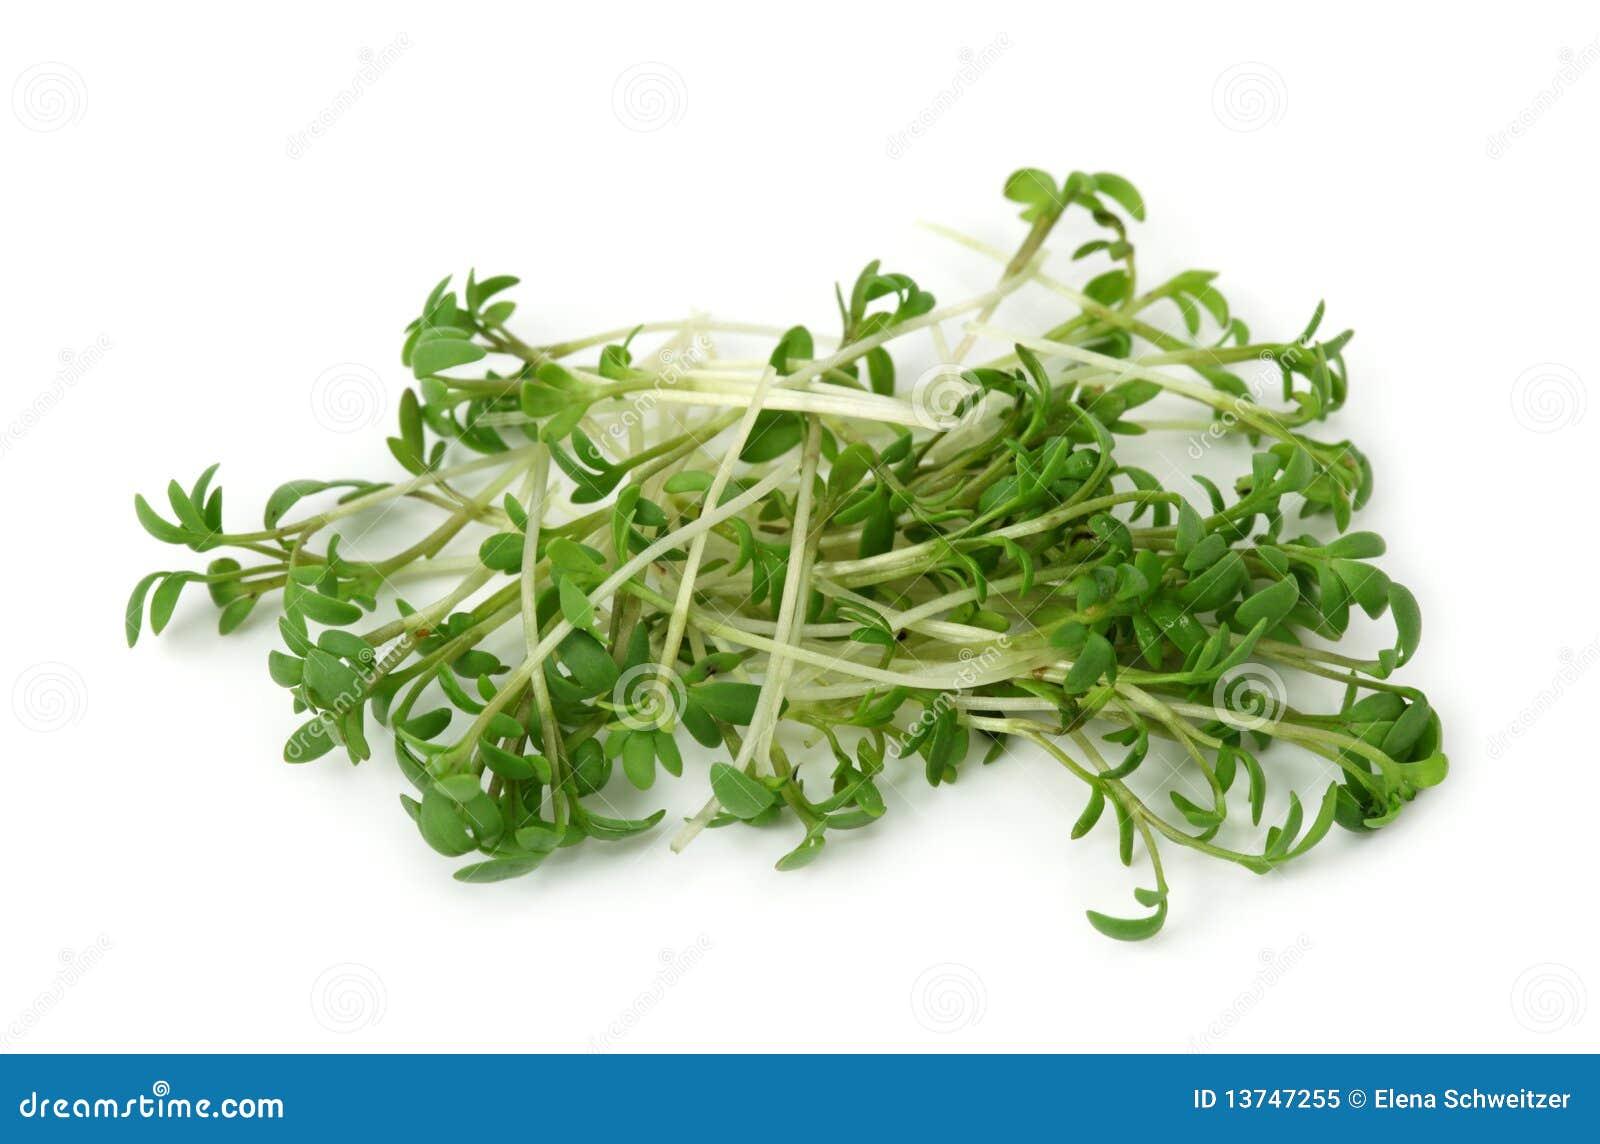 Cresson de jardin image stock image du nourriture sain - Culture du cresson de jardin ...